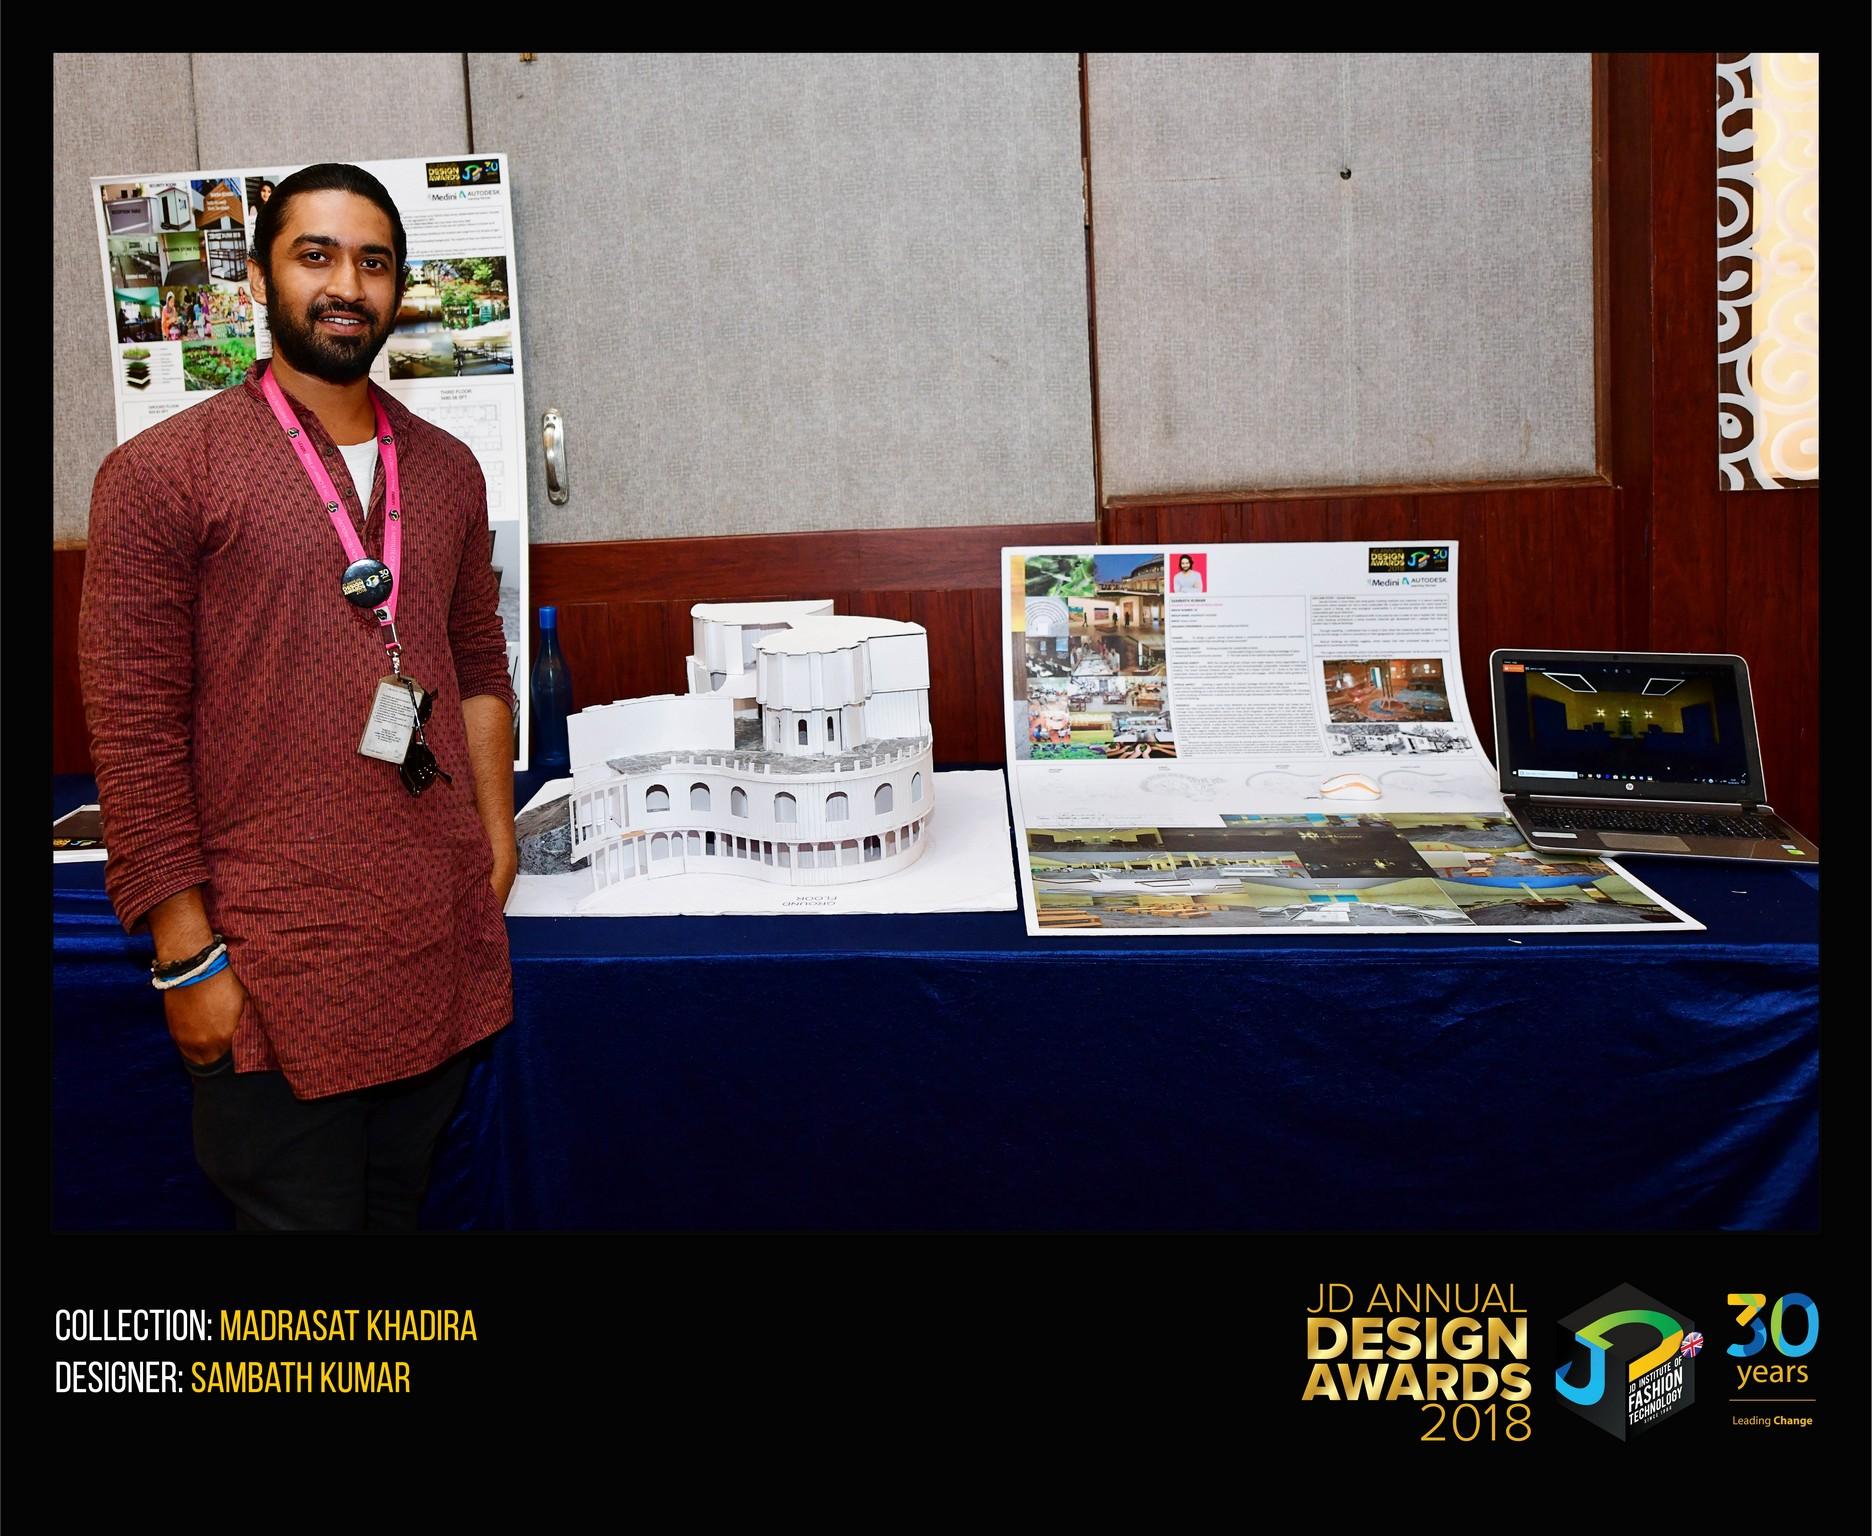 madrasat khadira Madrasat Khadira – Change – JD Annual Design Awards 2018 Madrasat Khadira